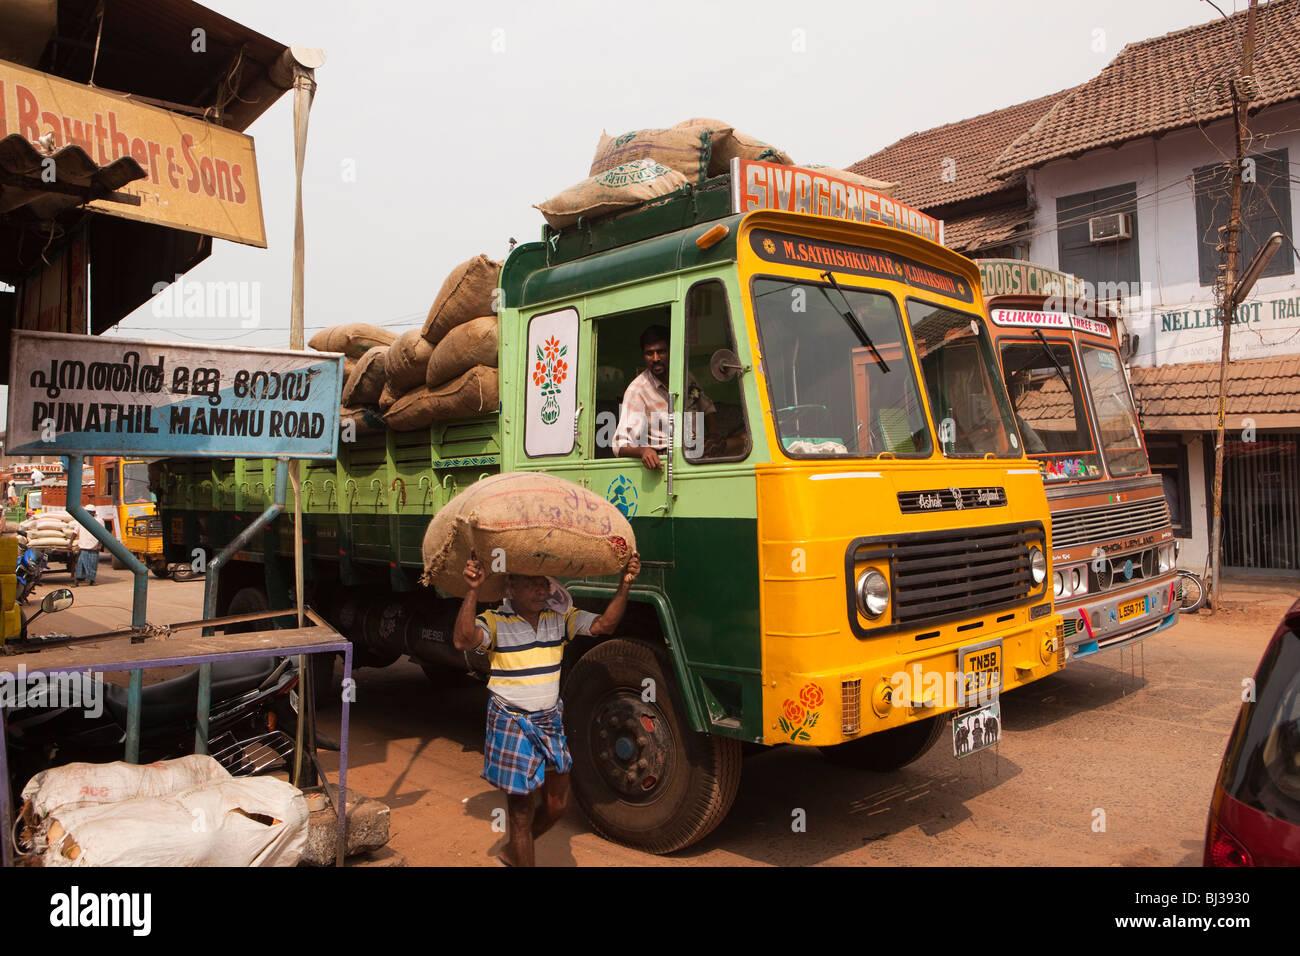 India, Kerala, Calicut, Kozhikode, Halwa Bazaar, man unloading sacks of spices from lorry - Stock Image